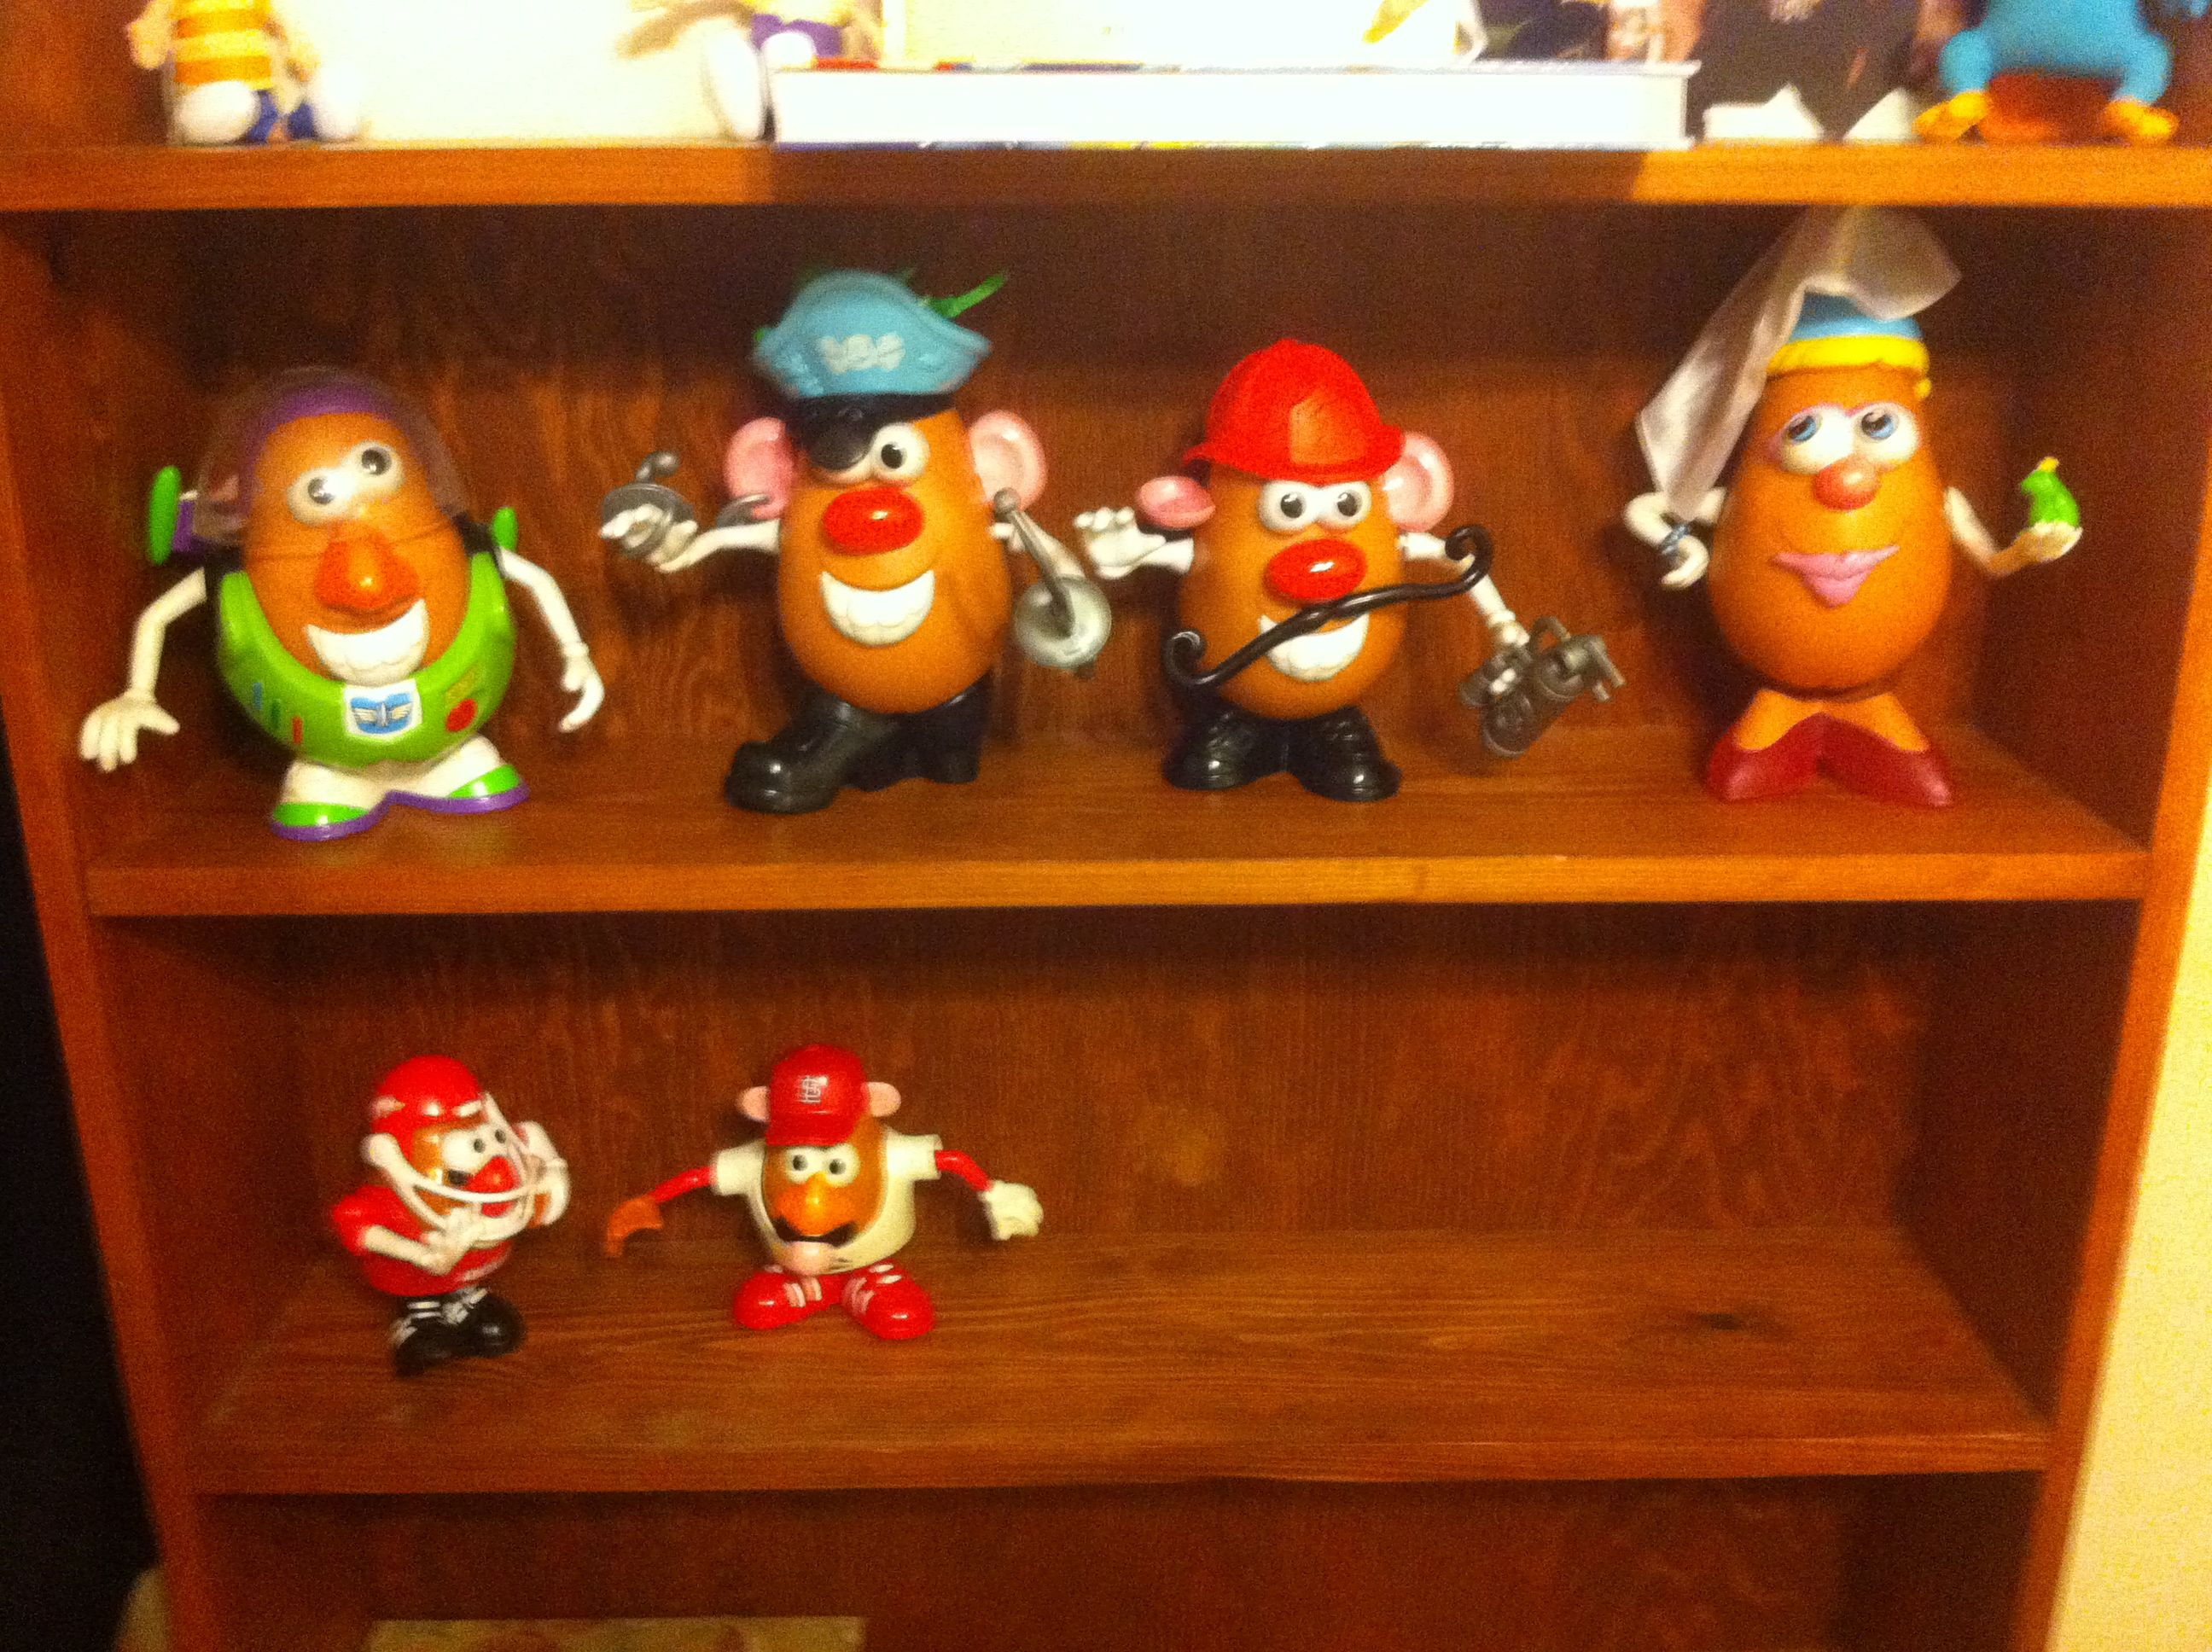 Spud Lightyear, Pirate Spud, Firefighter Spud, Fairy Princess Spud, Arkansas Razorbacks, St Louis Cardinals